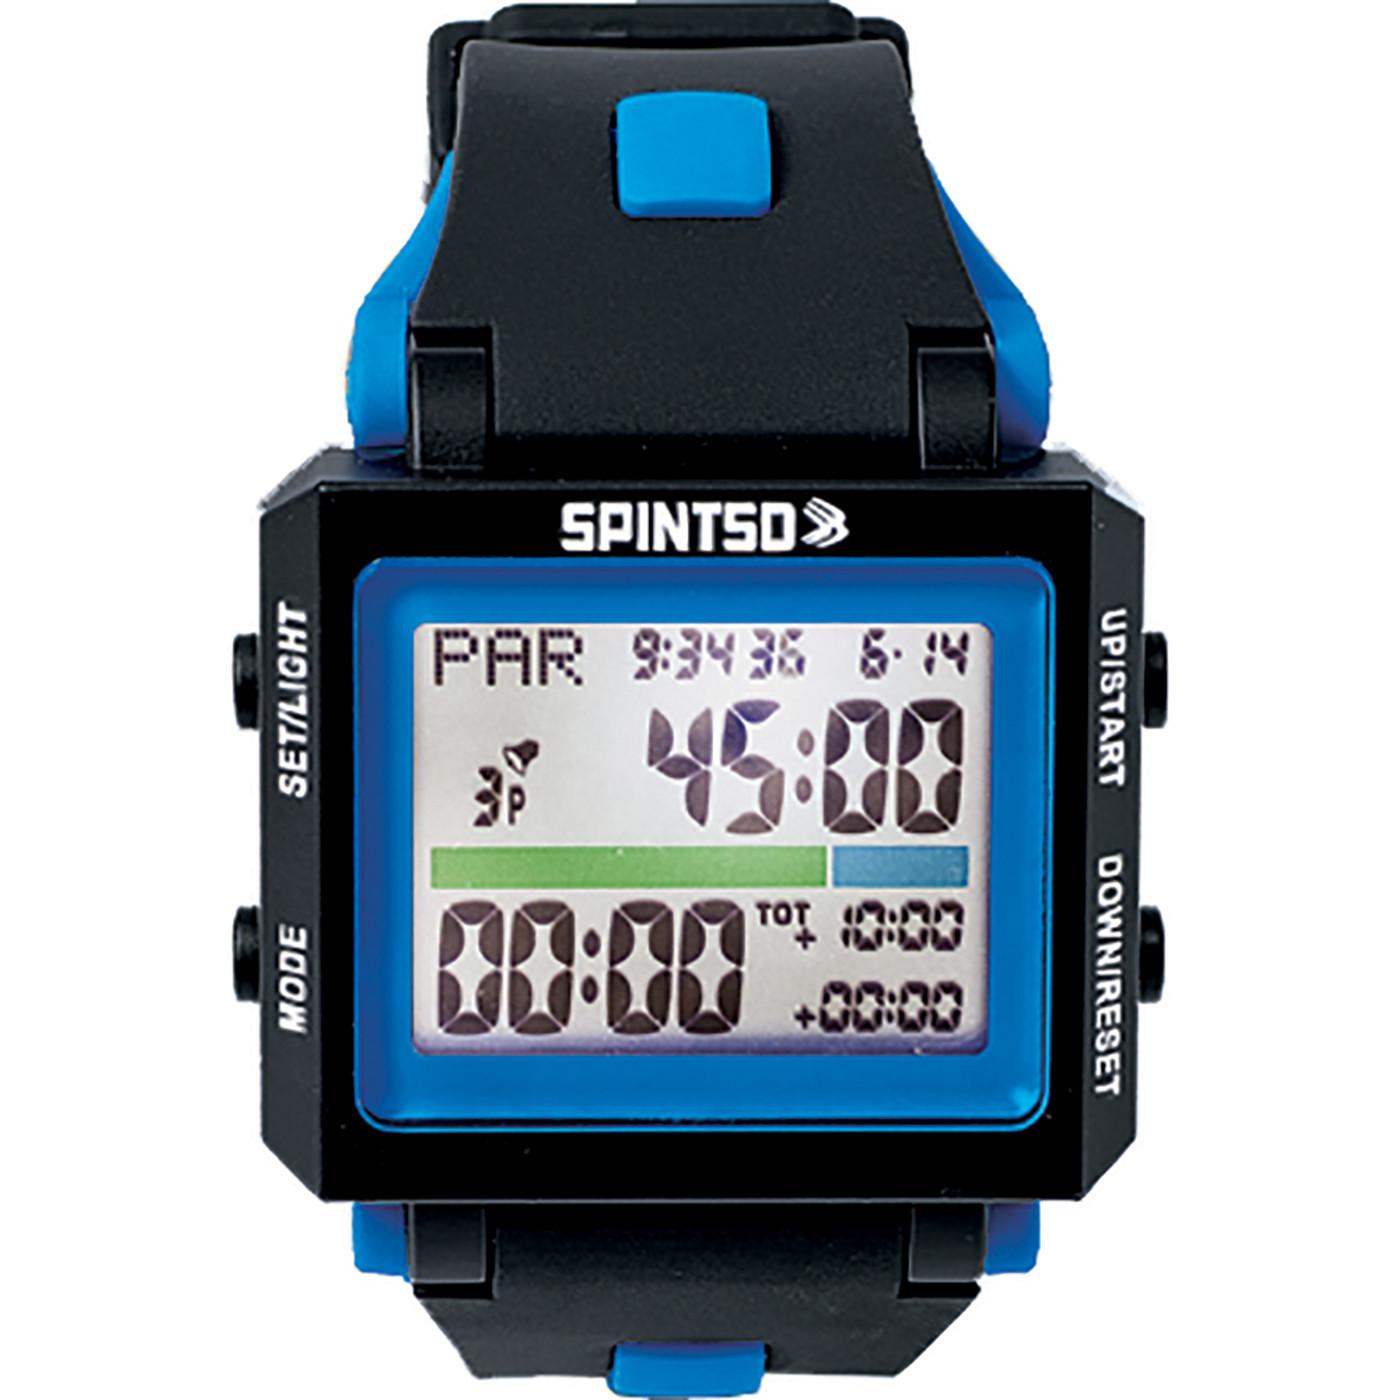 1973 Spintso 2X  Watch